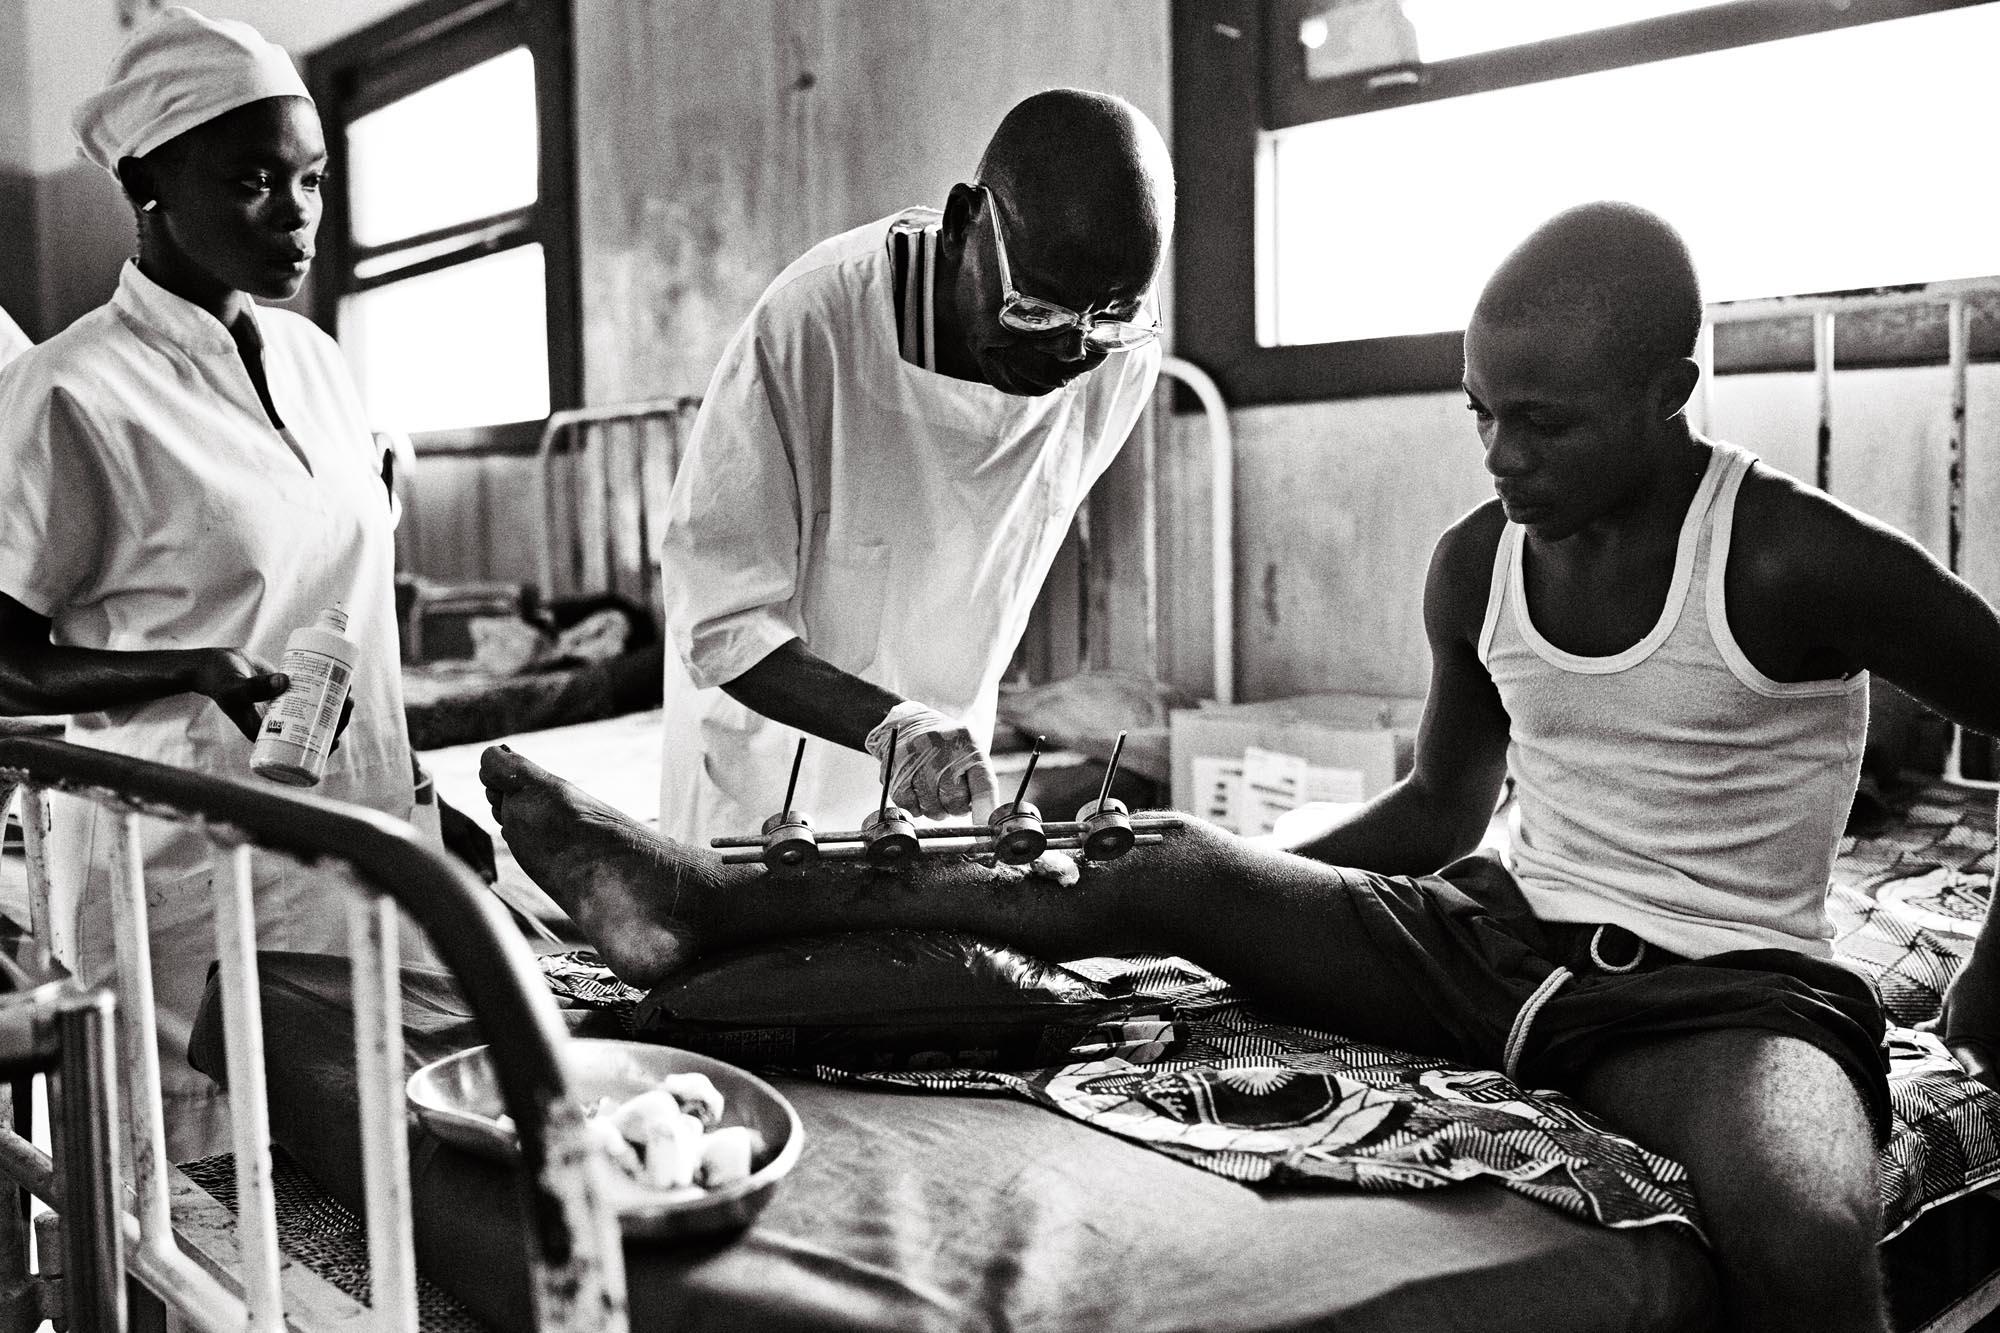 Mosango Hospital, Democratic Republic of Congo. 2013.